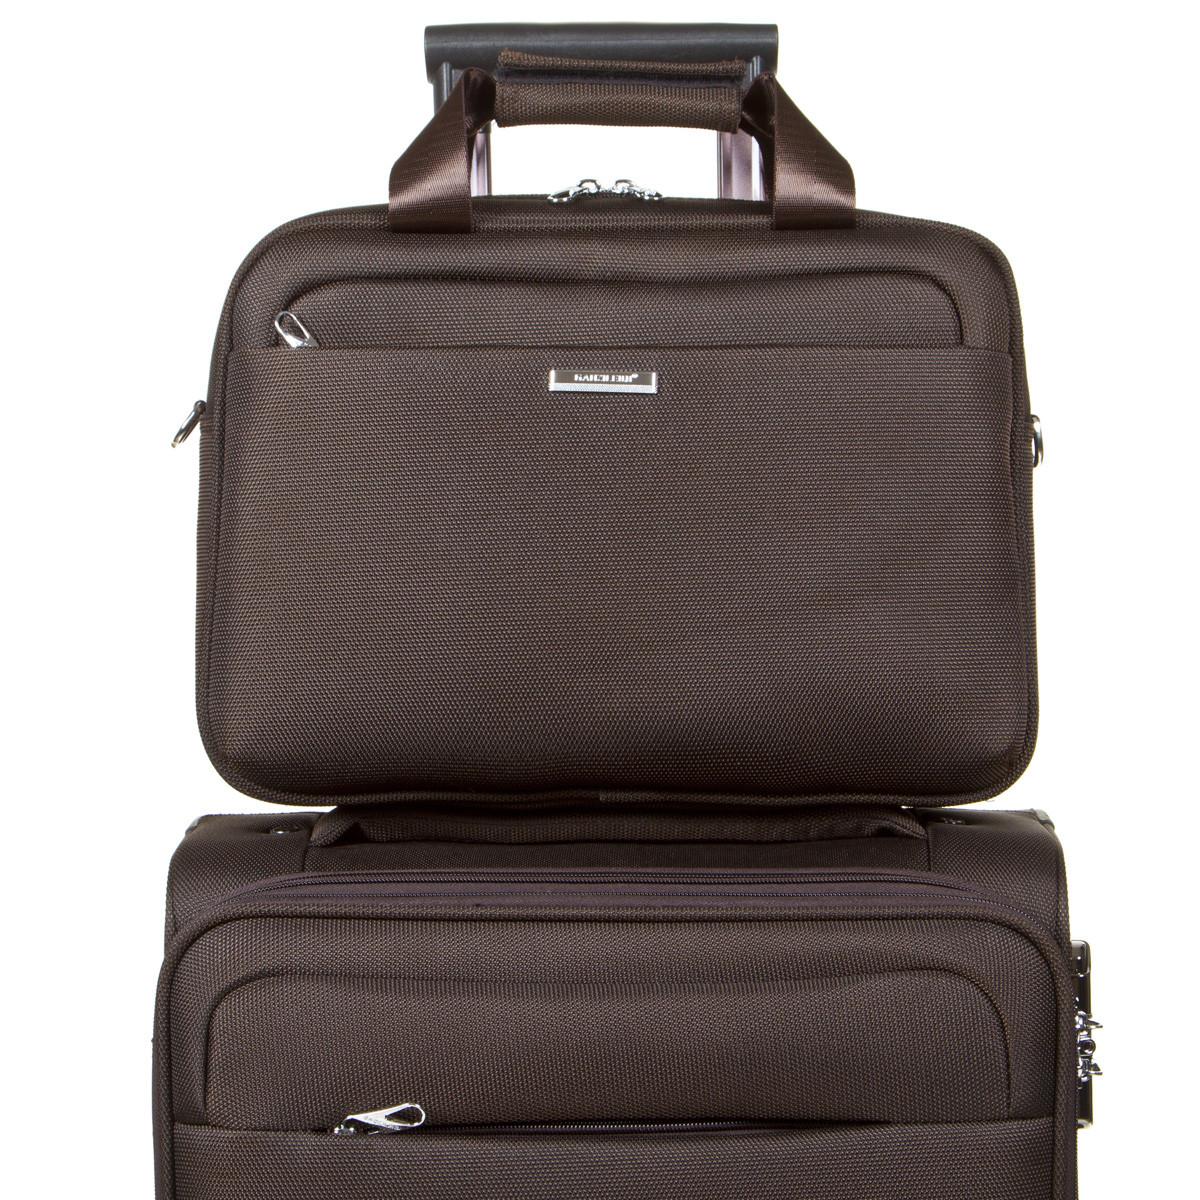 Дорожная универсальная сумка-бьютик BagHouse с креплением на ручку чемодана 38х29х15 ксГЦ868кор